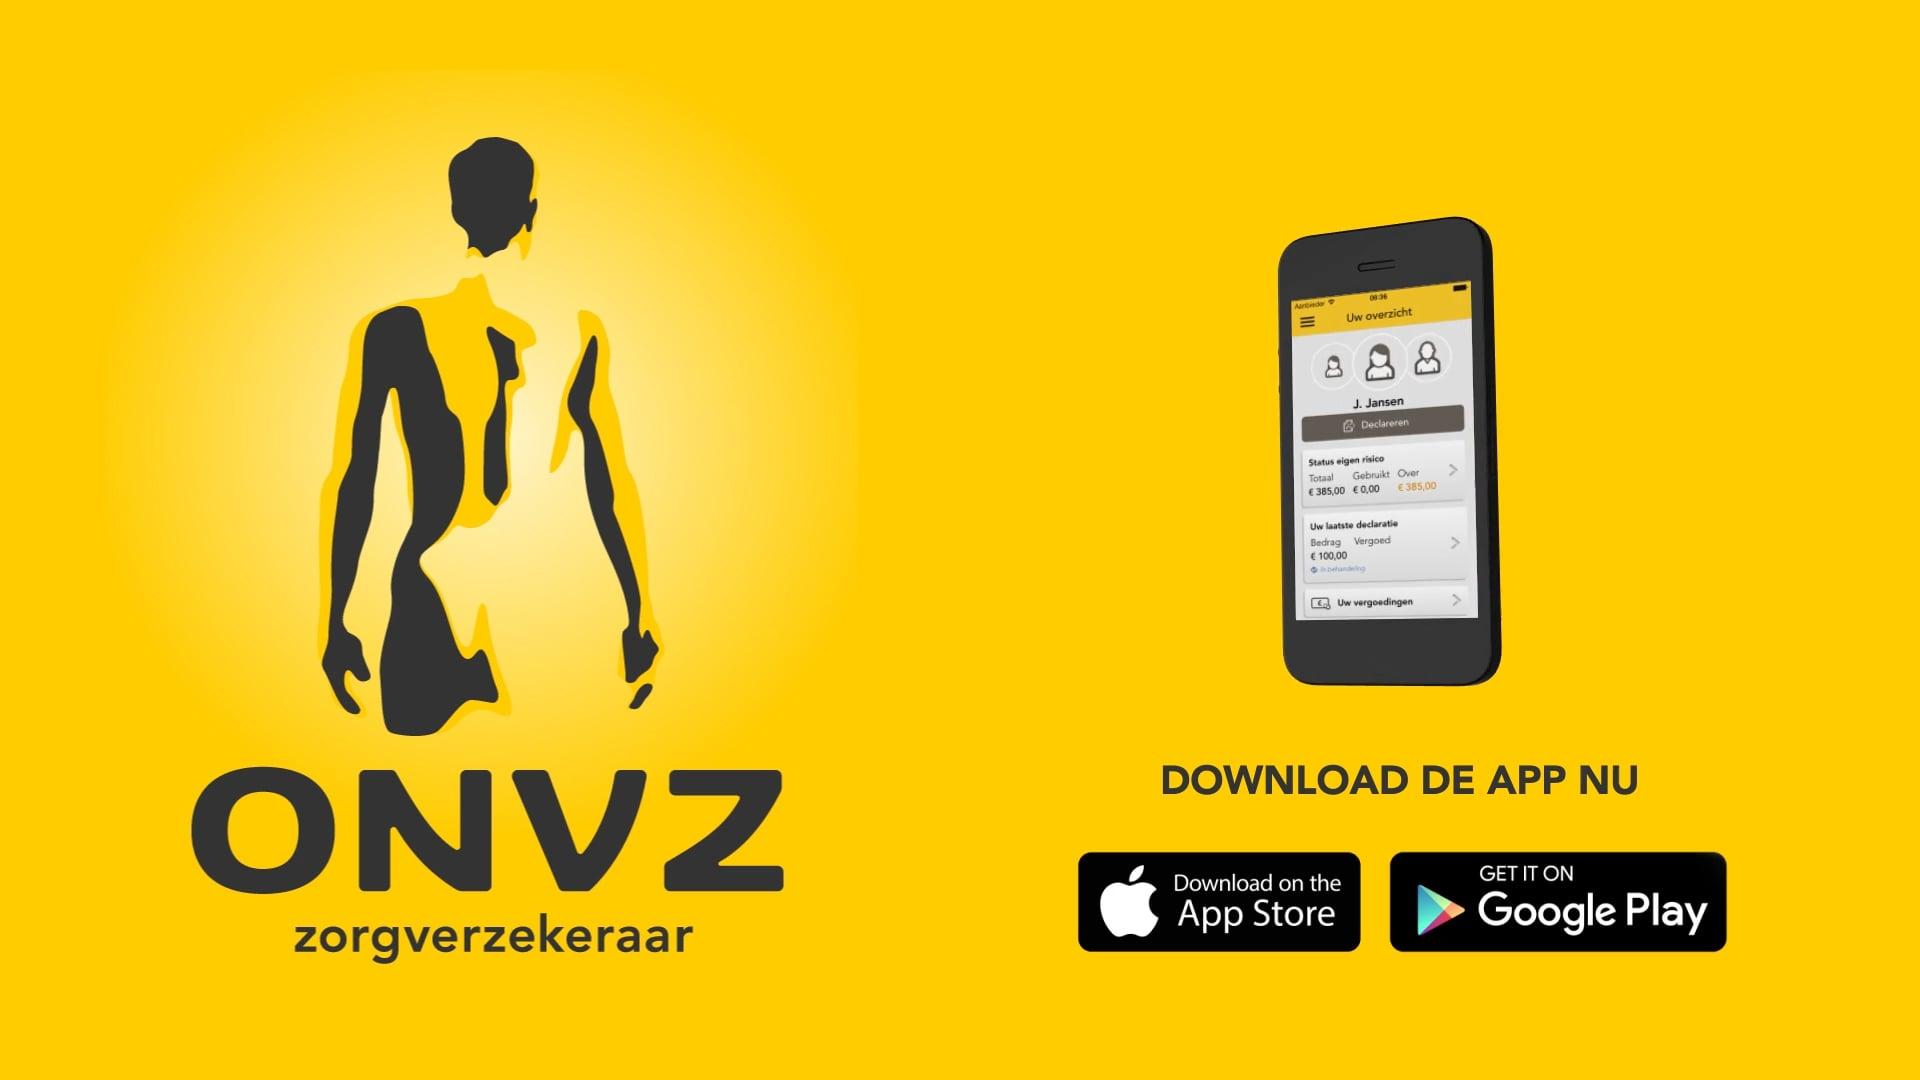 ONVZ app is vernieuwd